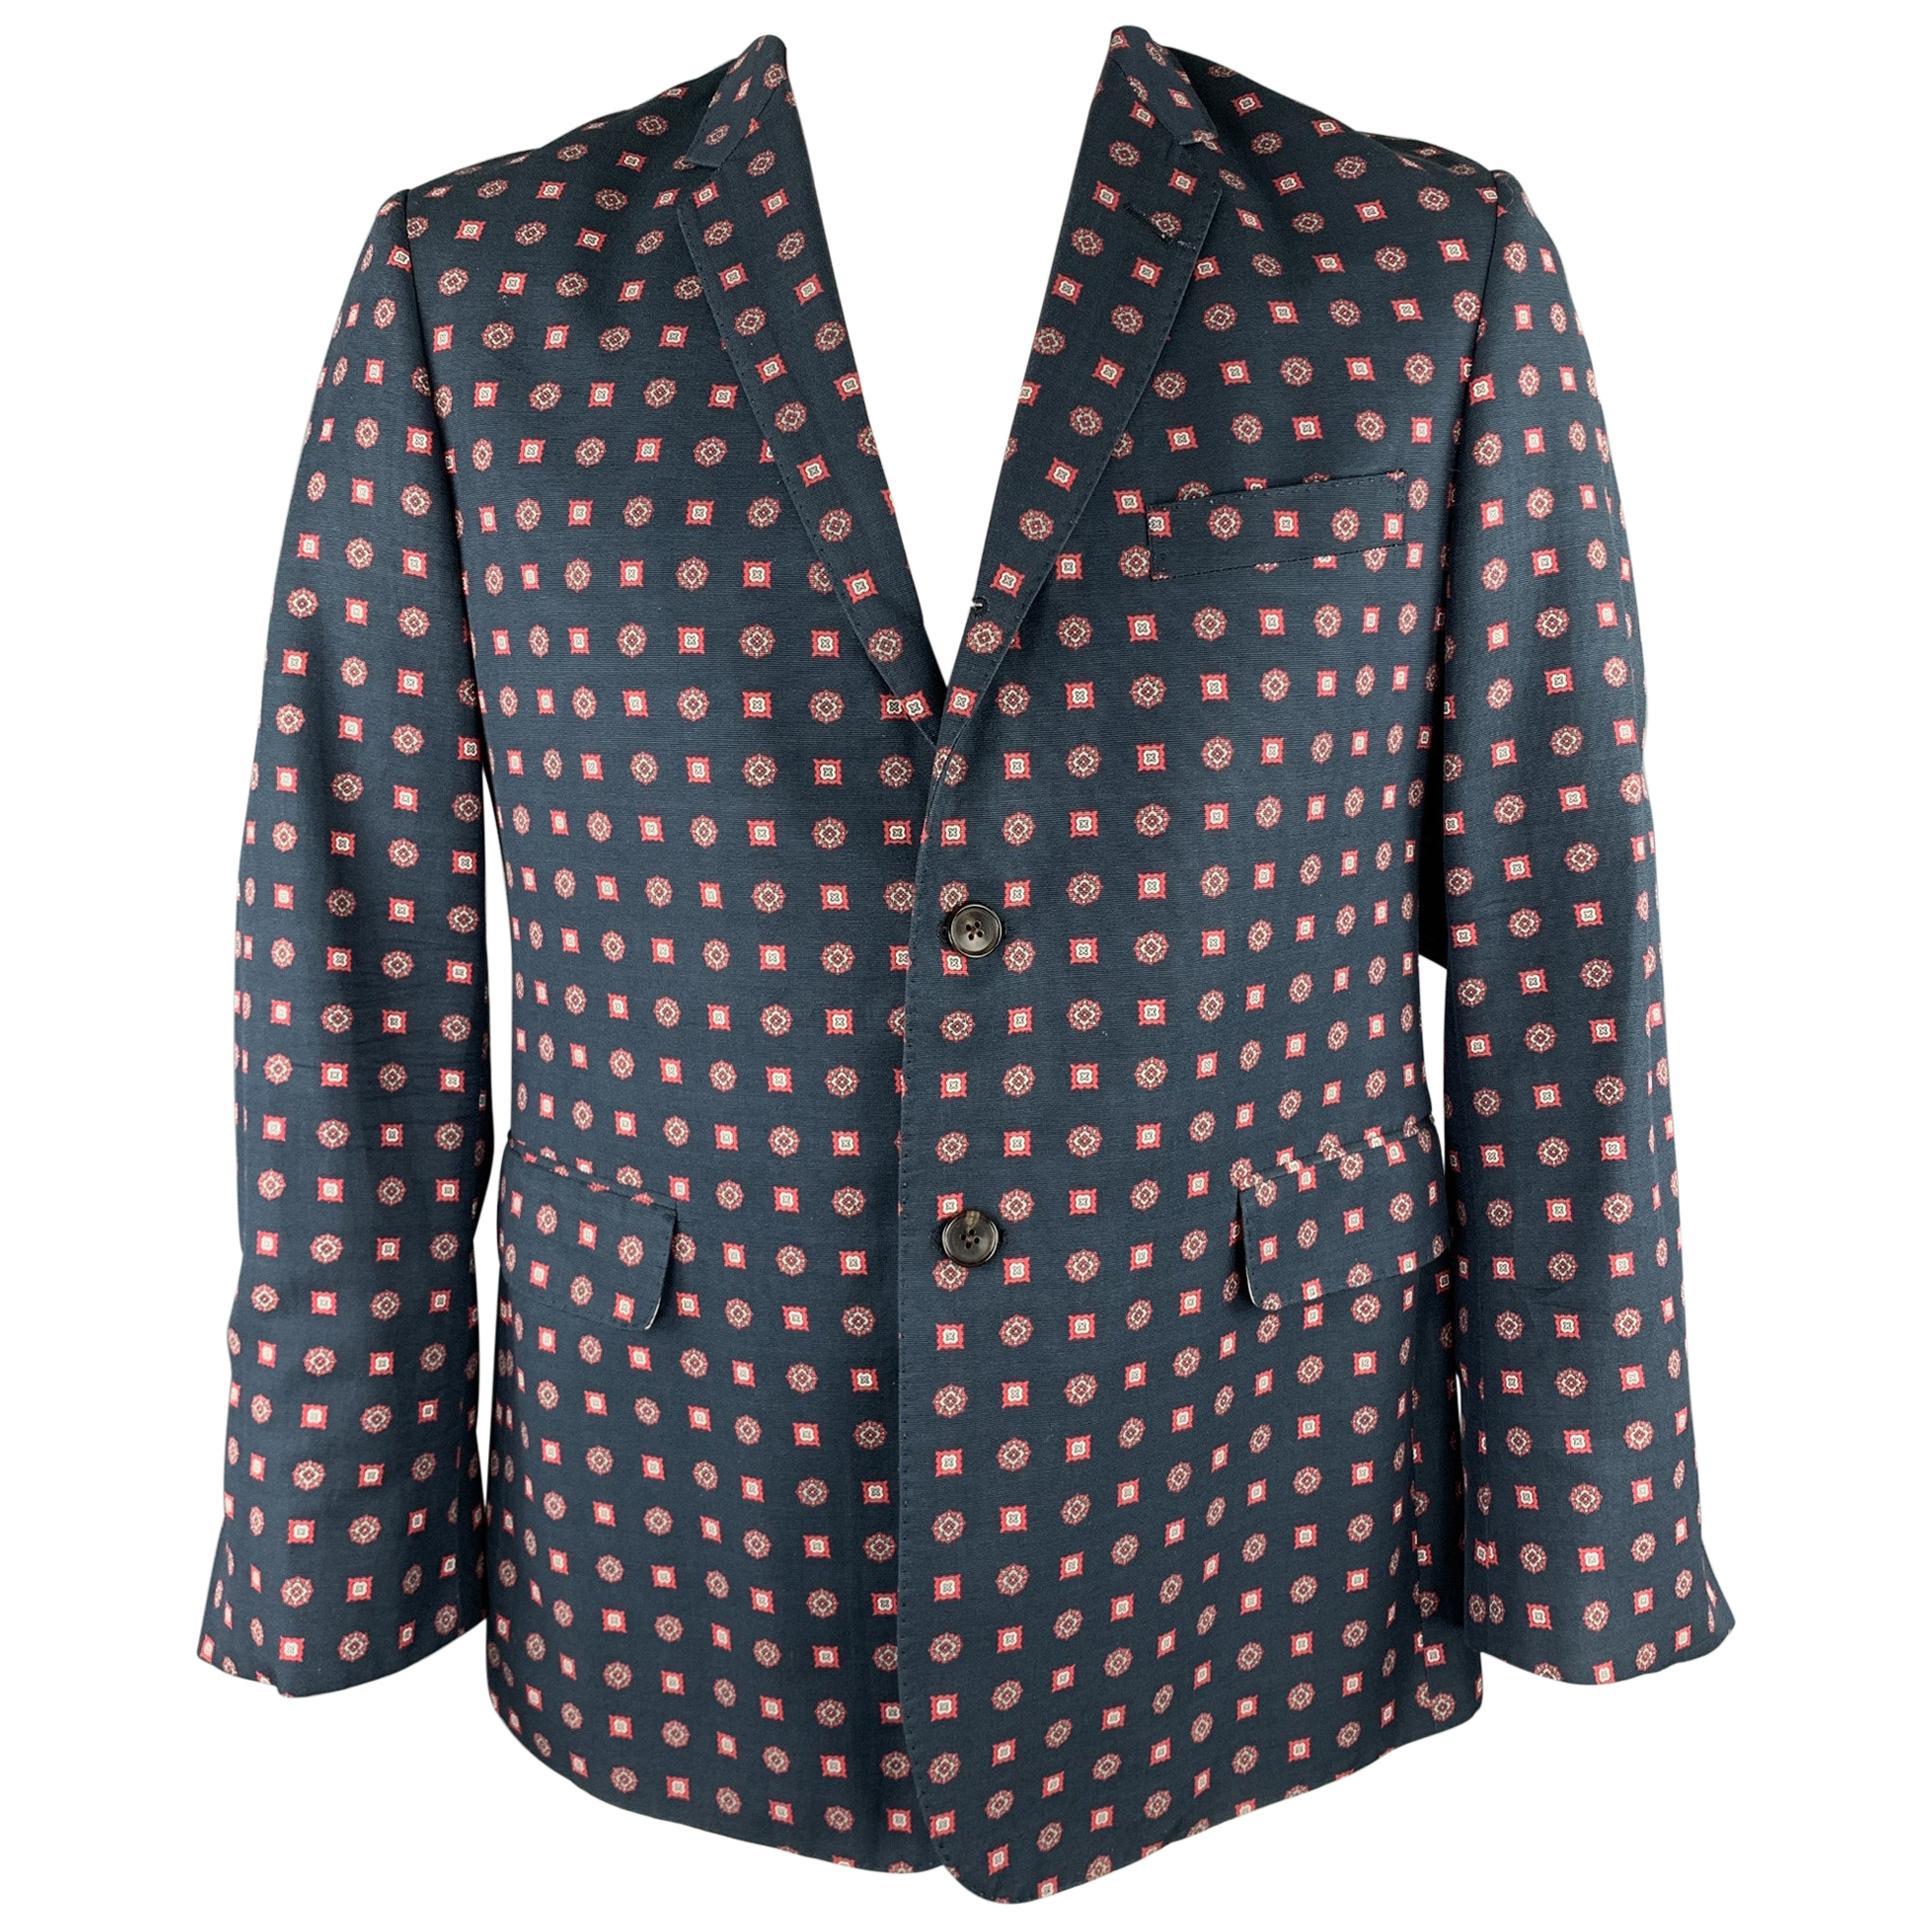 BLACK FLEECE Navy Print Cotton / Viscose Notch Lapel Sport Coat